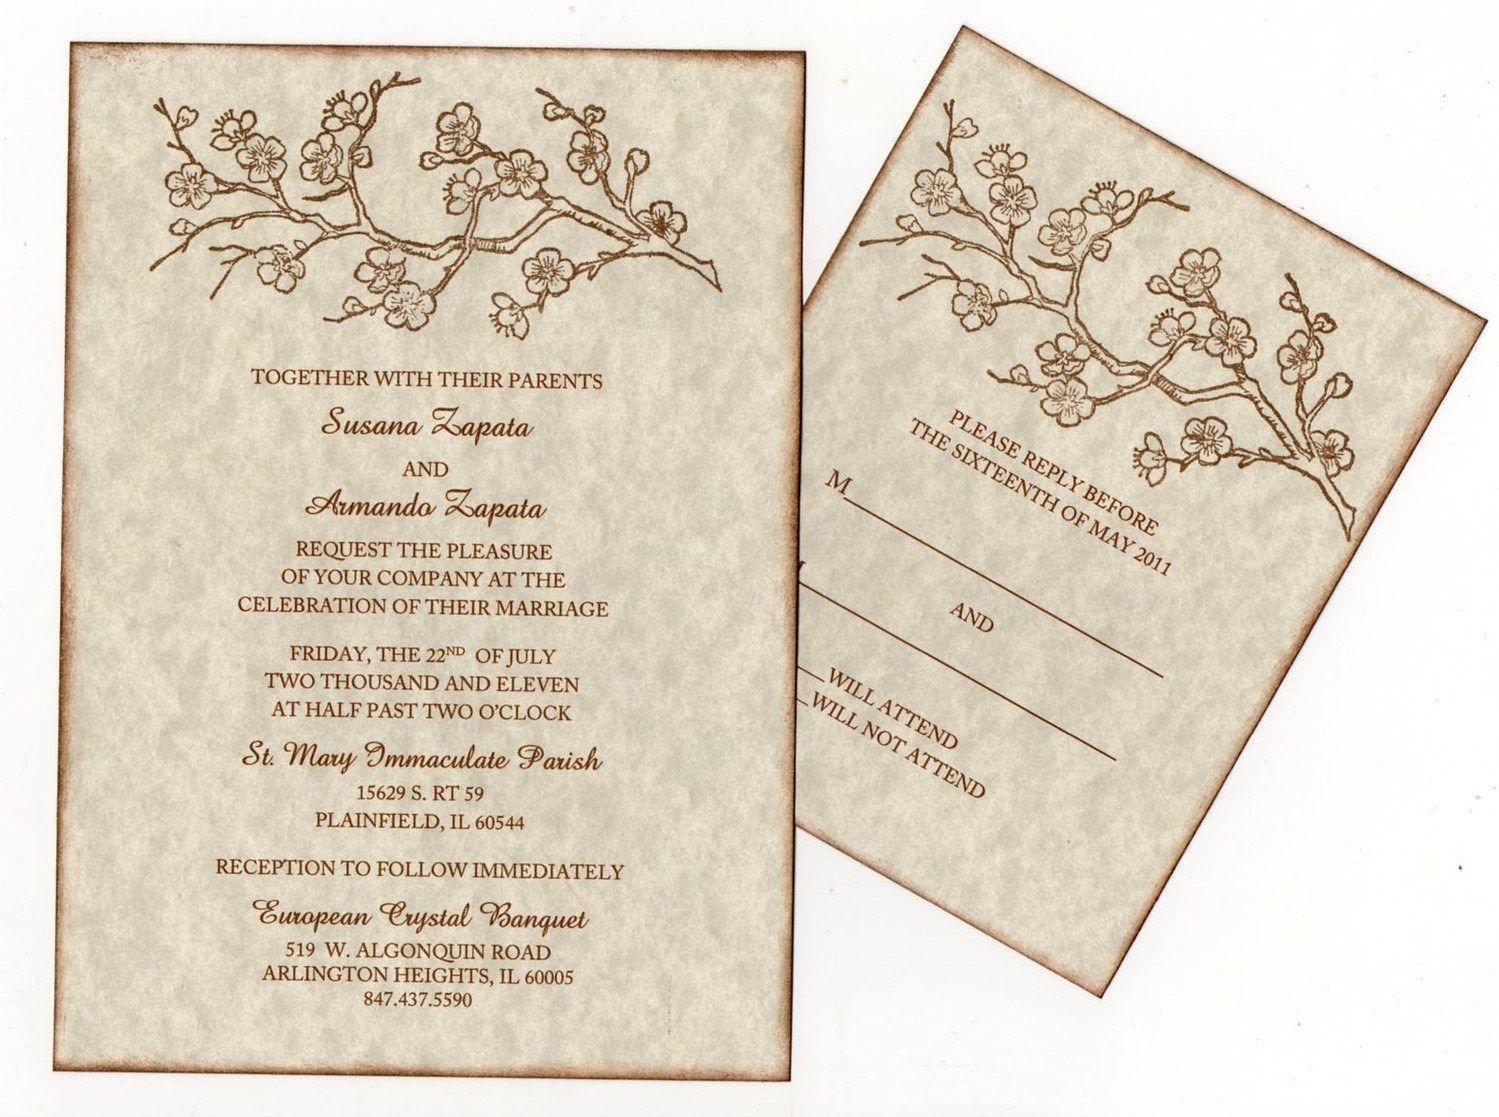 Indian Wedding Invitation Indian Wedding Invitation Card Designs Manish Sharma Regiosfera Com Indian Wedding Invitation Card Design Indian Wedding Invitation Cards Marriage Invitation Card